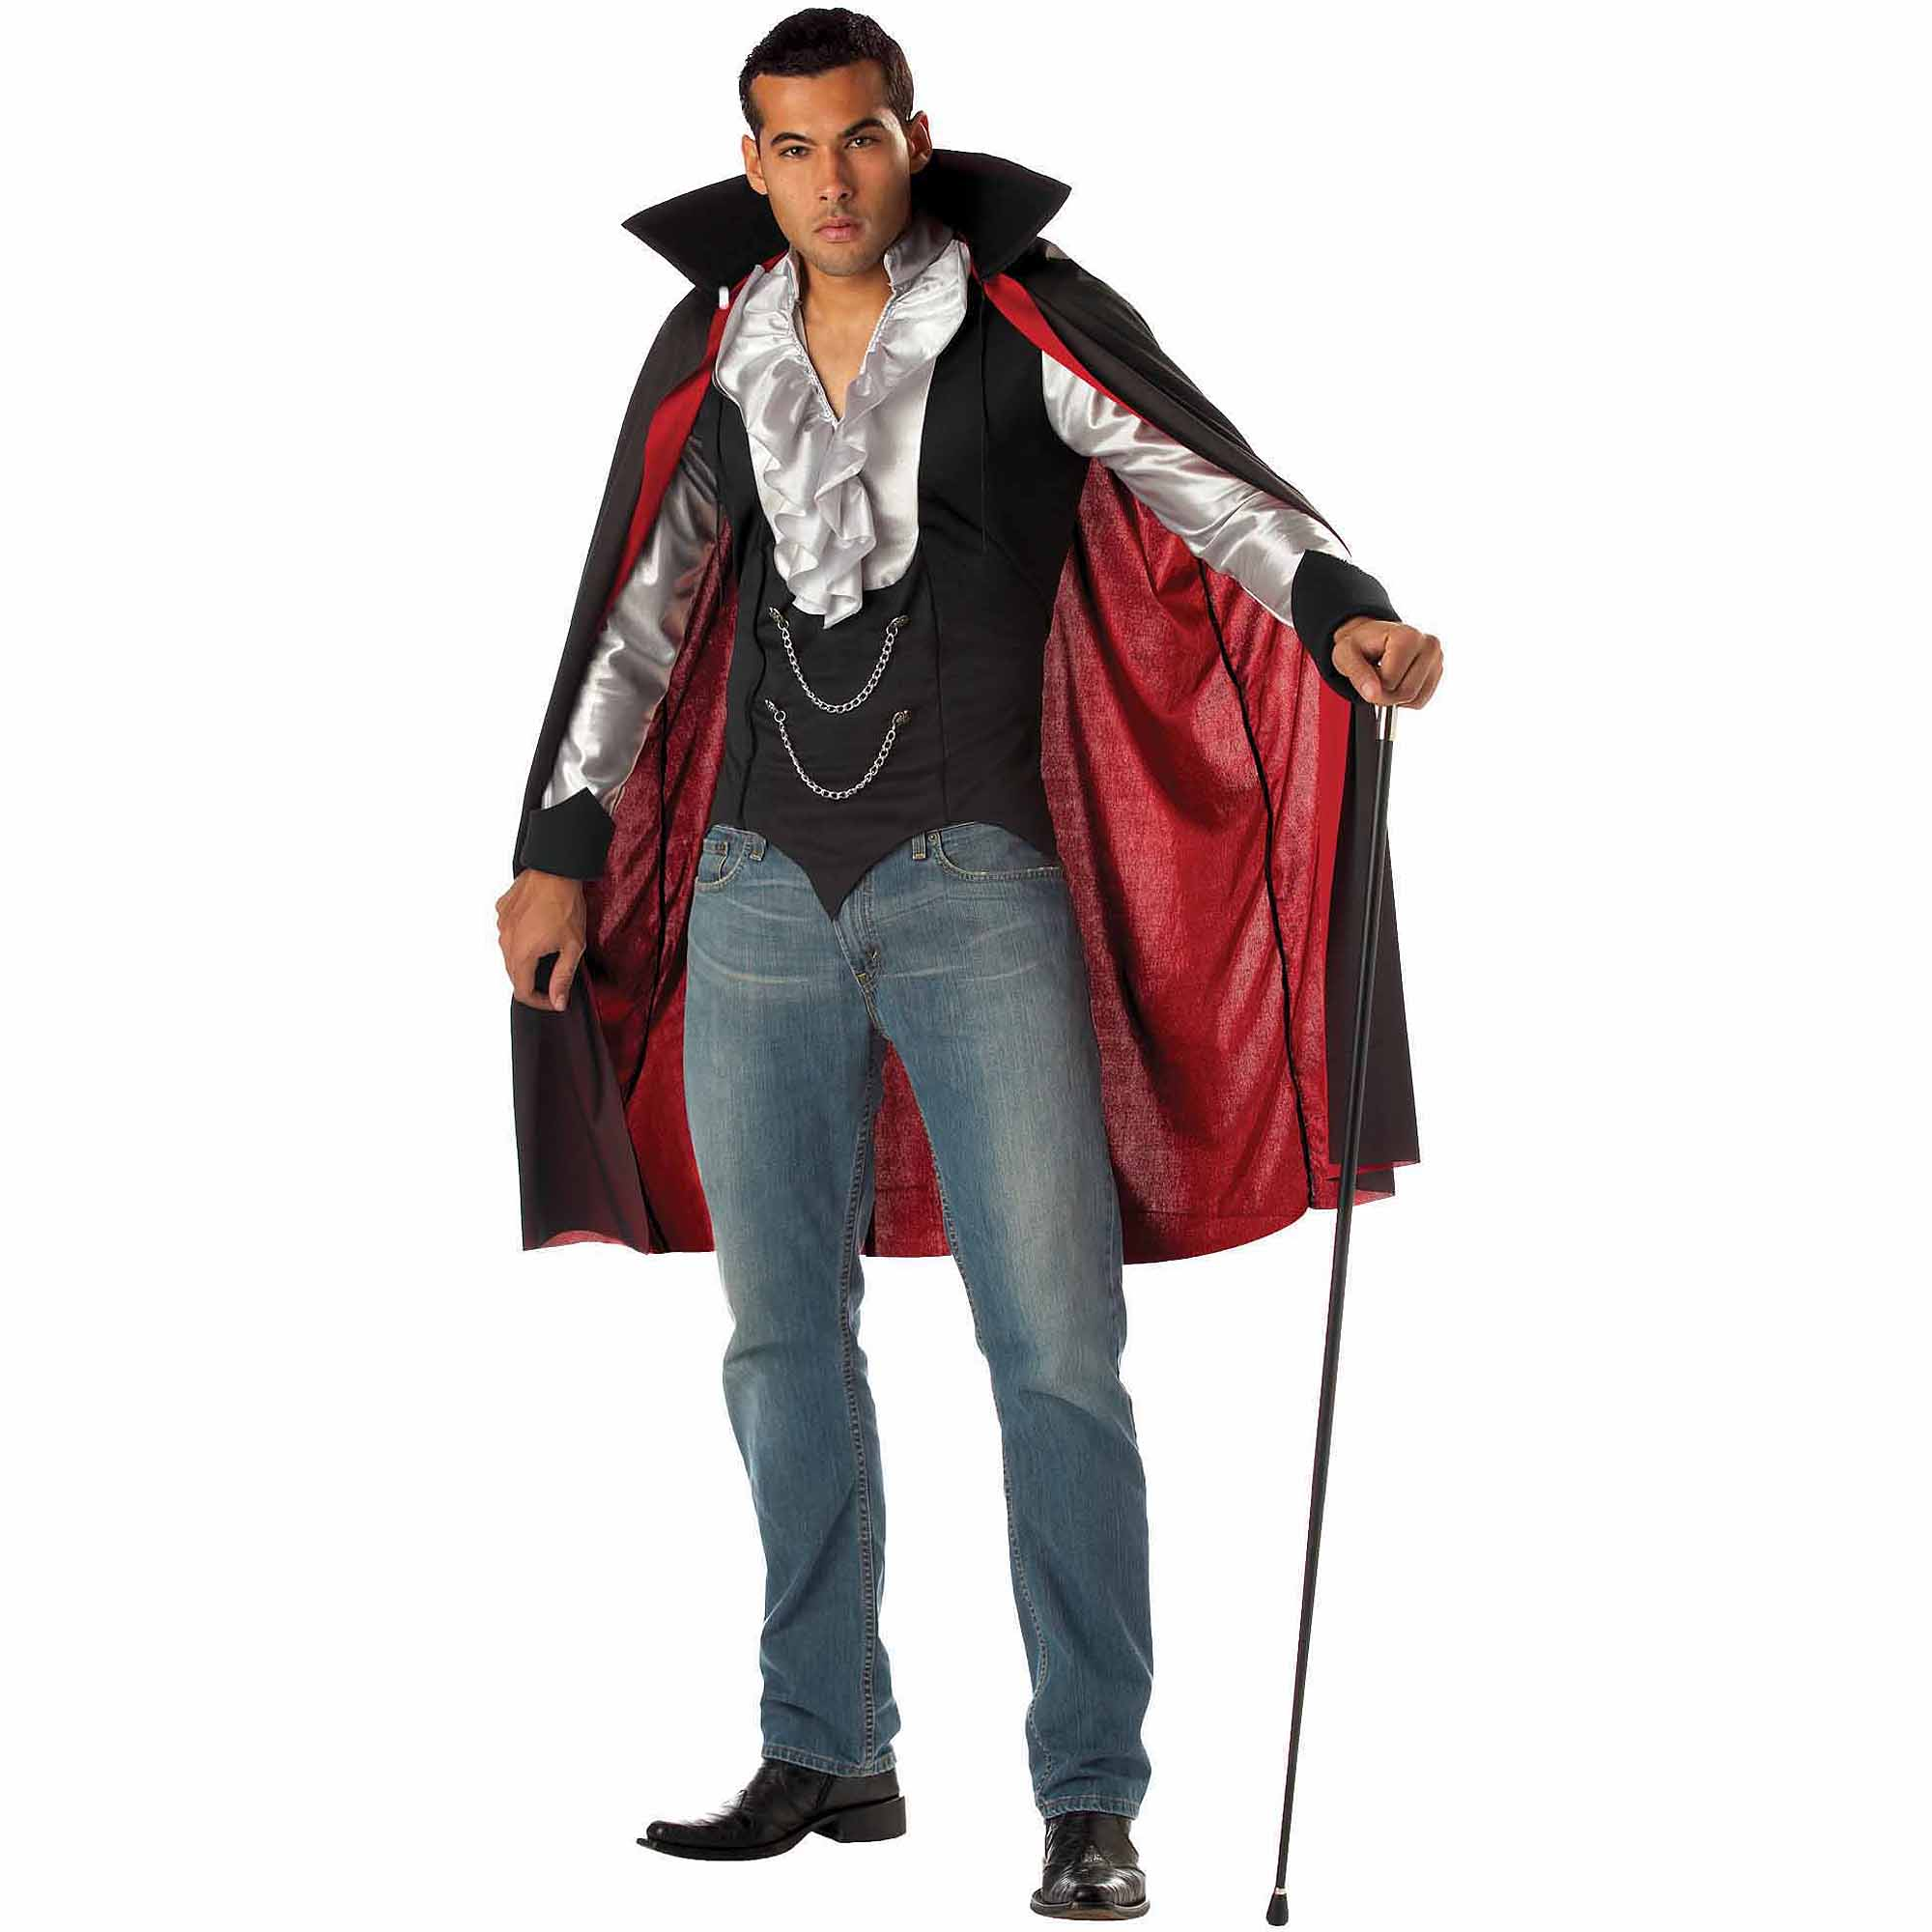 Cool Vampire Adult Halloween Costume